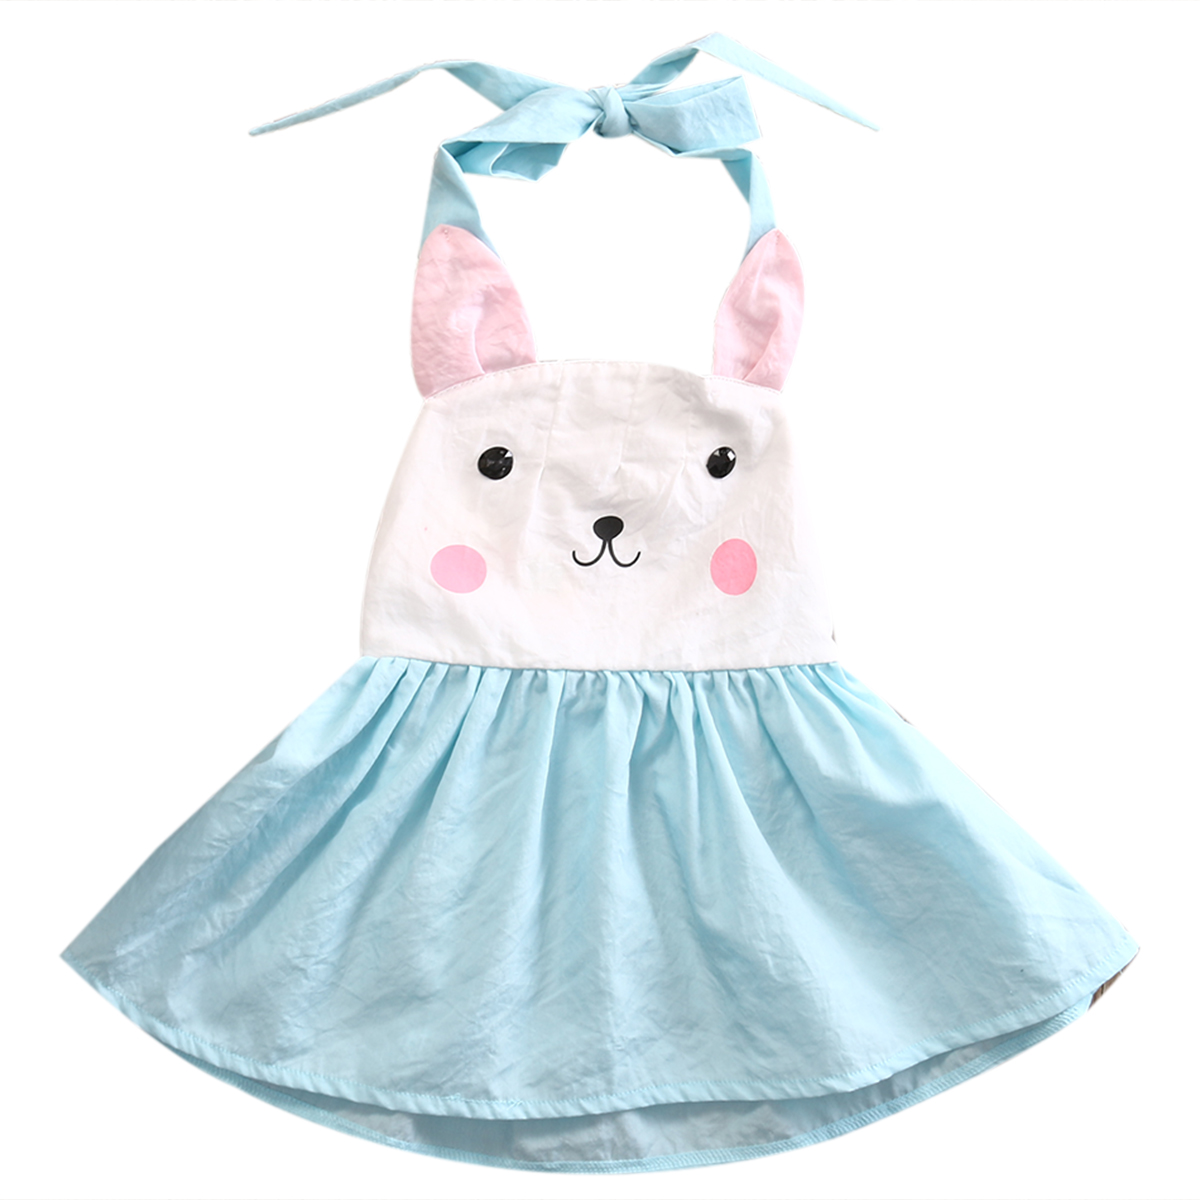 2017 Summer Toddler Baby Kids Girls Rabbit Dress Party Wedding Gown ...